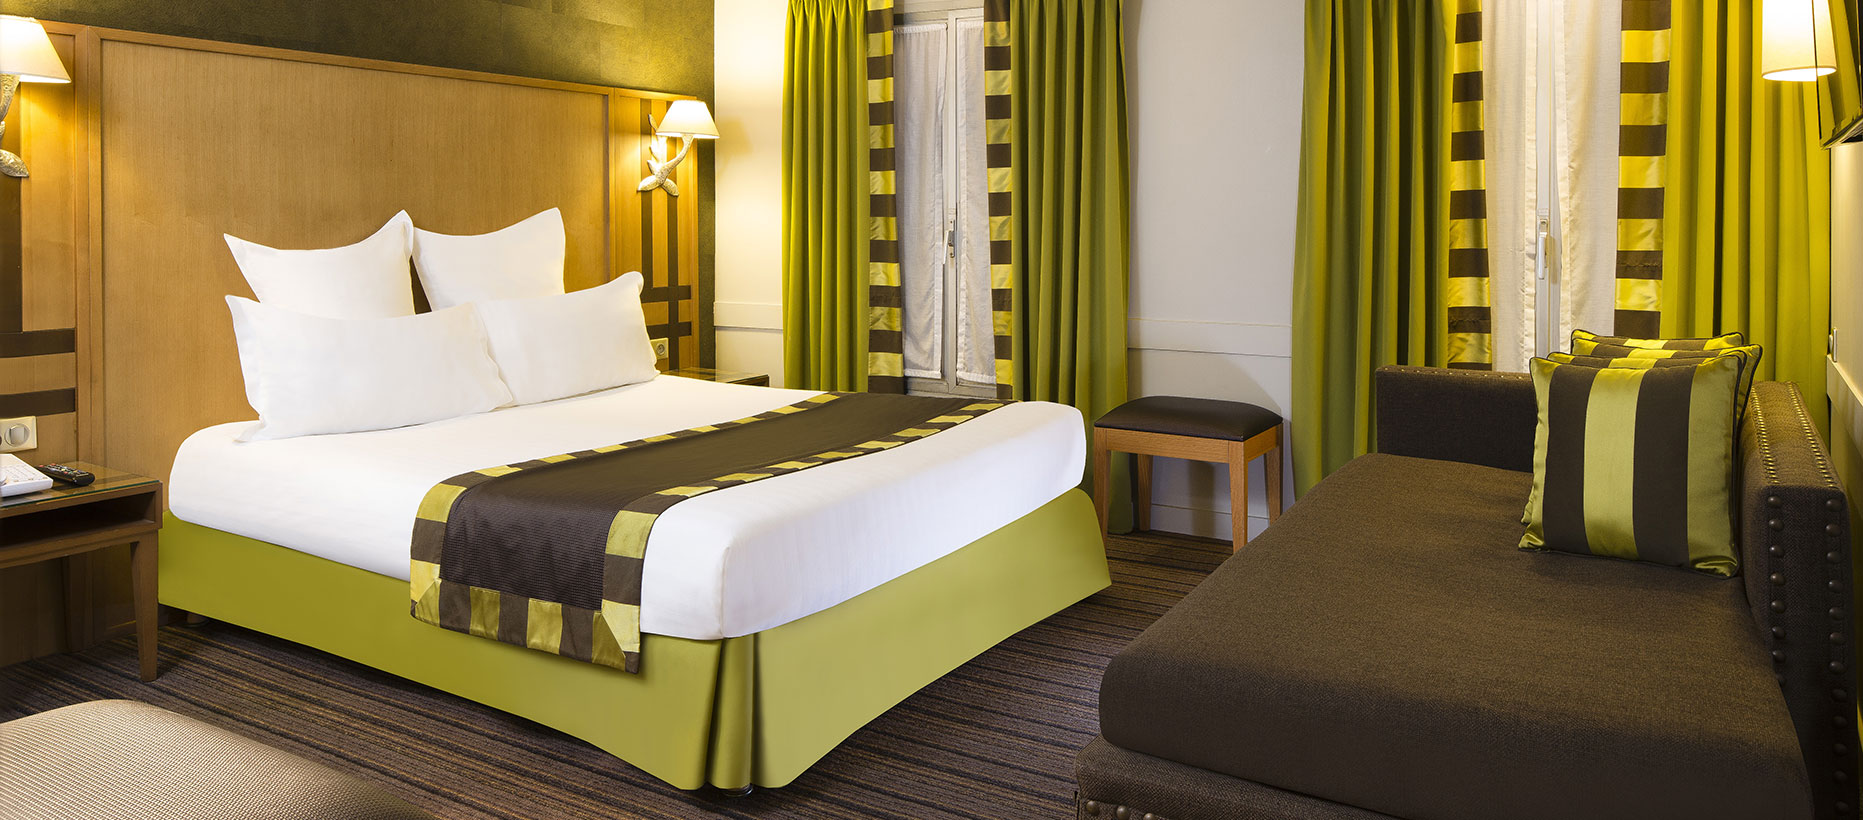 hotel mondial paris h tel mondial paris op ra. Black Bedroom Furniture Sets. Home Design Ideas